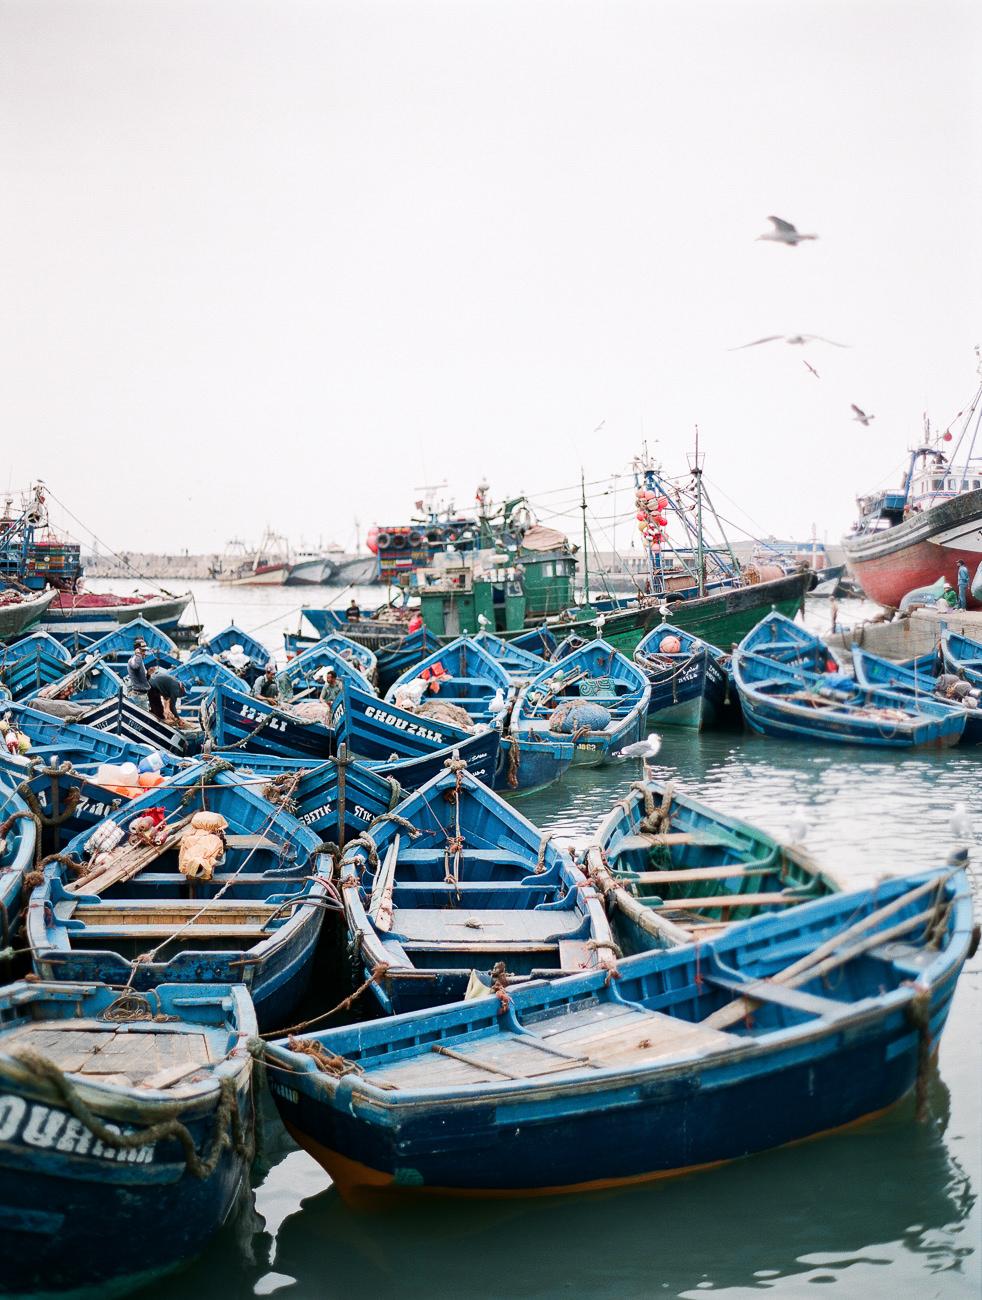 marrakech-photographe-voyage-alain-m-1.jpg